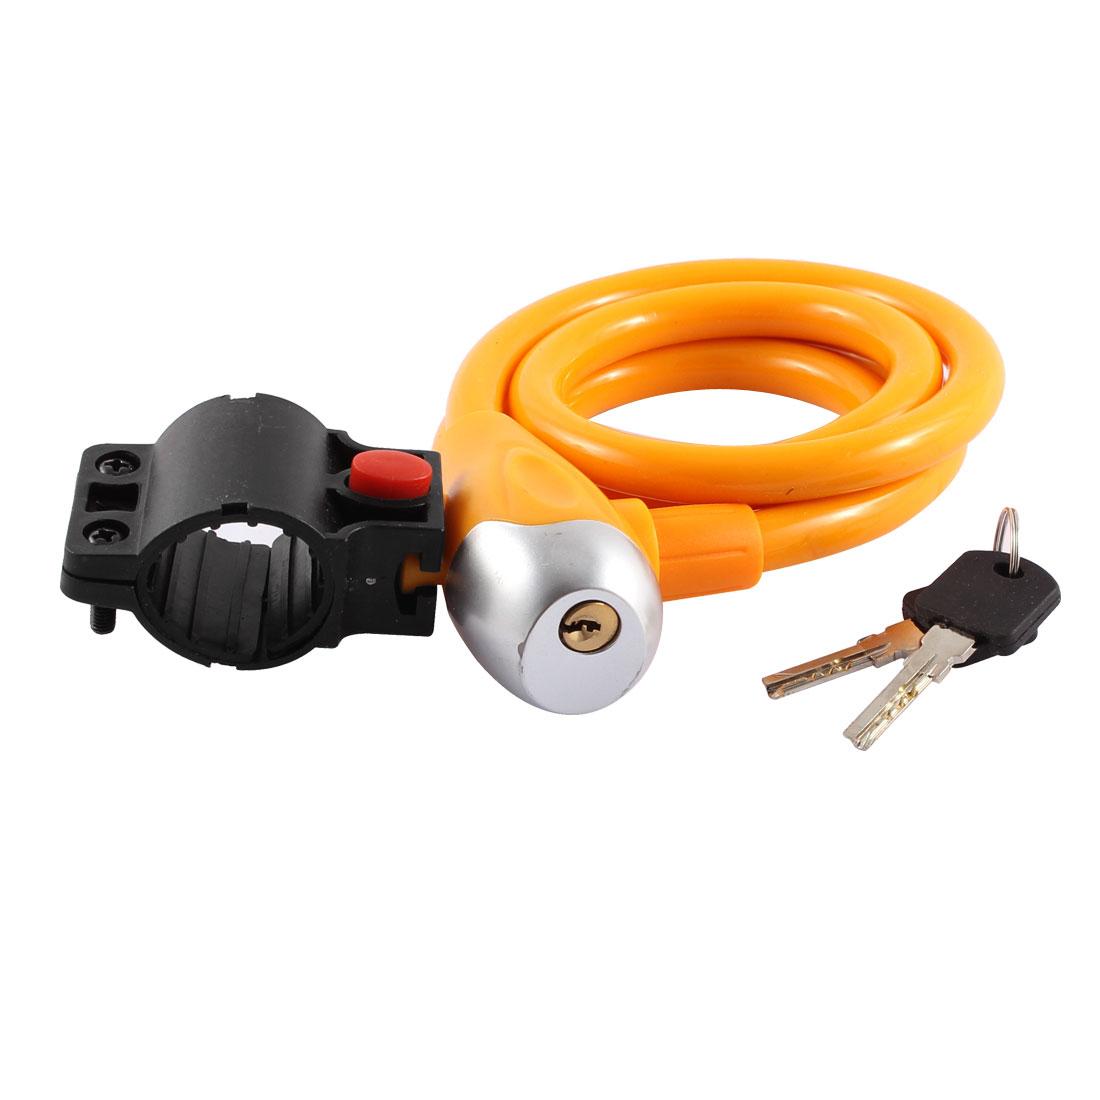 1.2m Length Bicycle Safeguard Steel Wire Inside Locking Lock Yellow w 2 Key